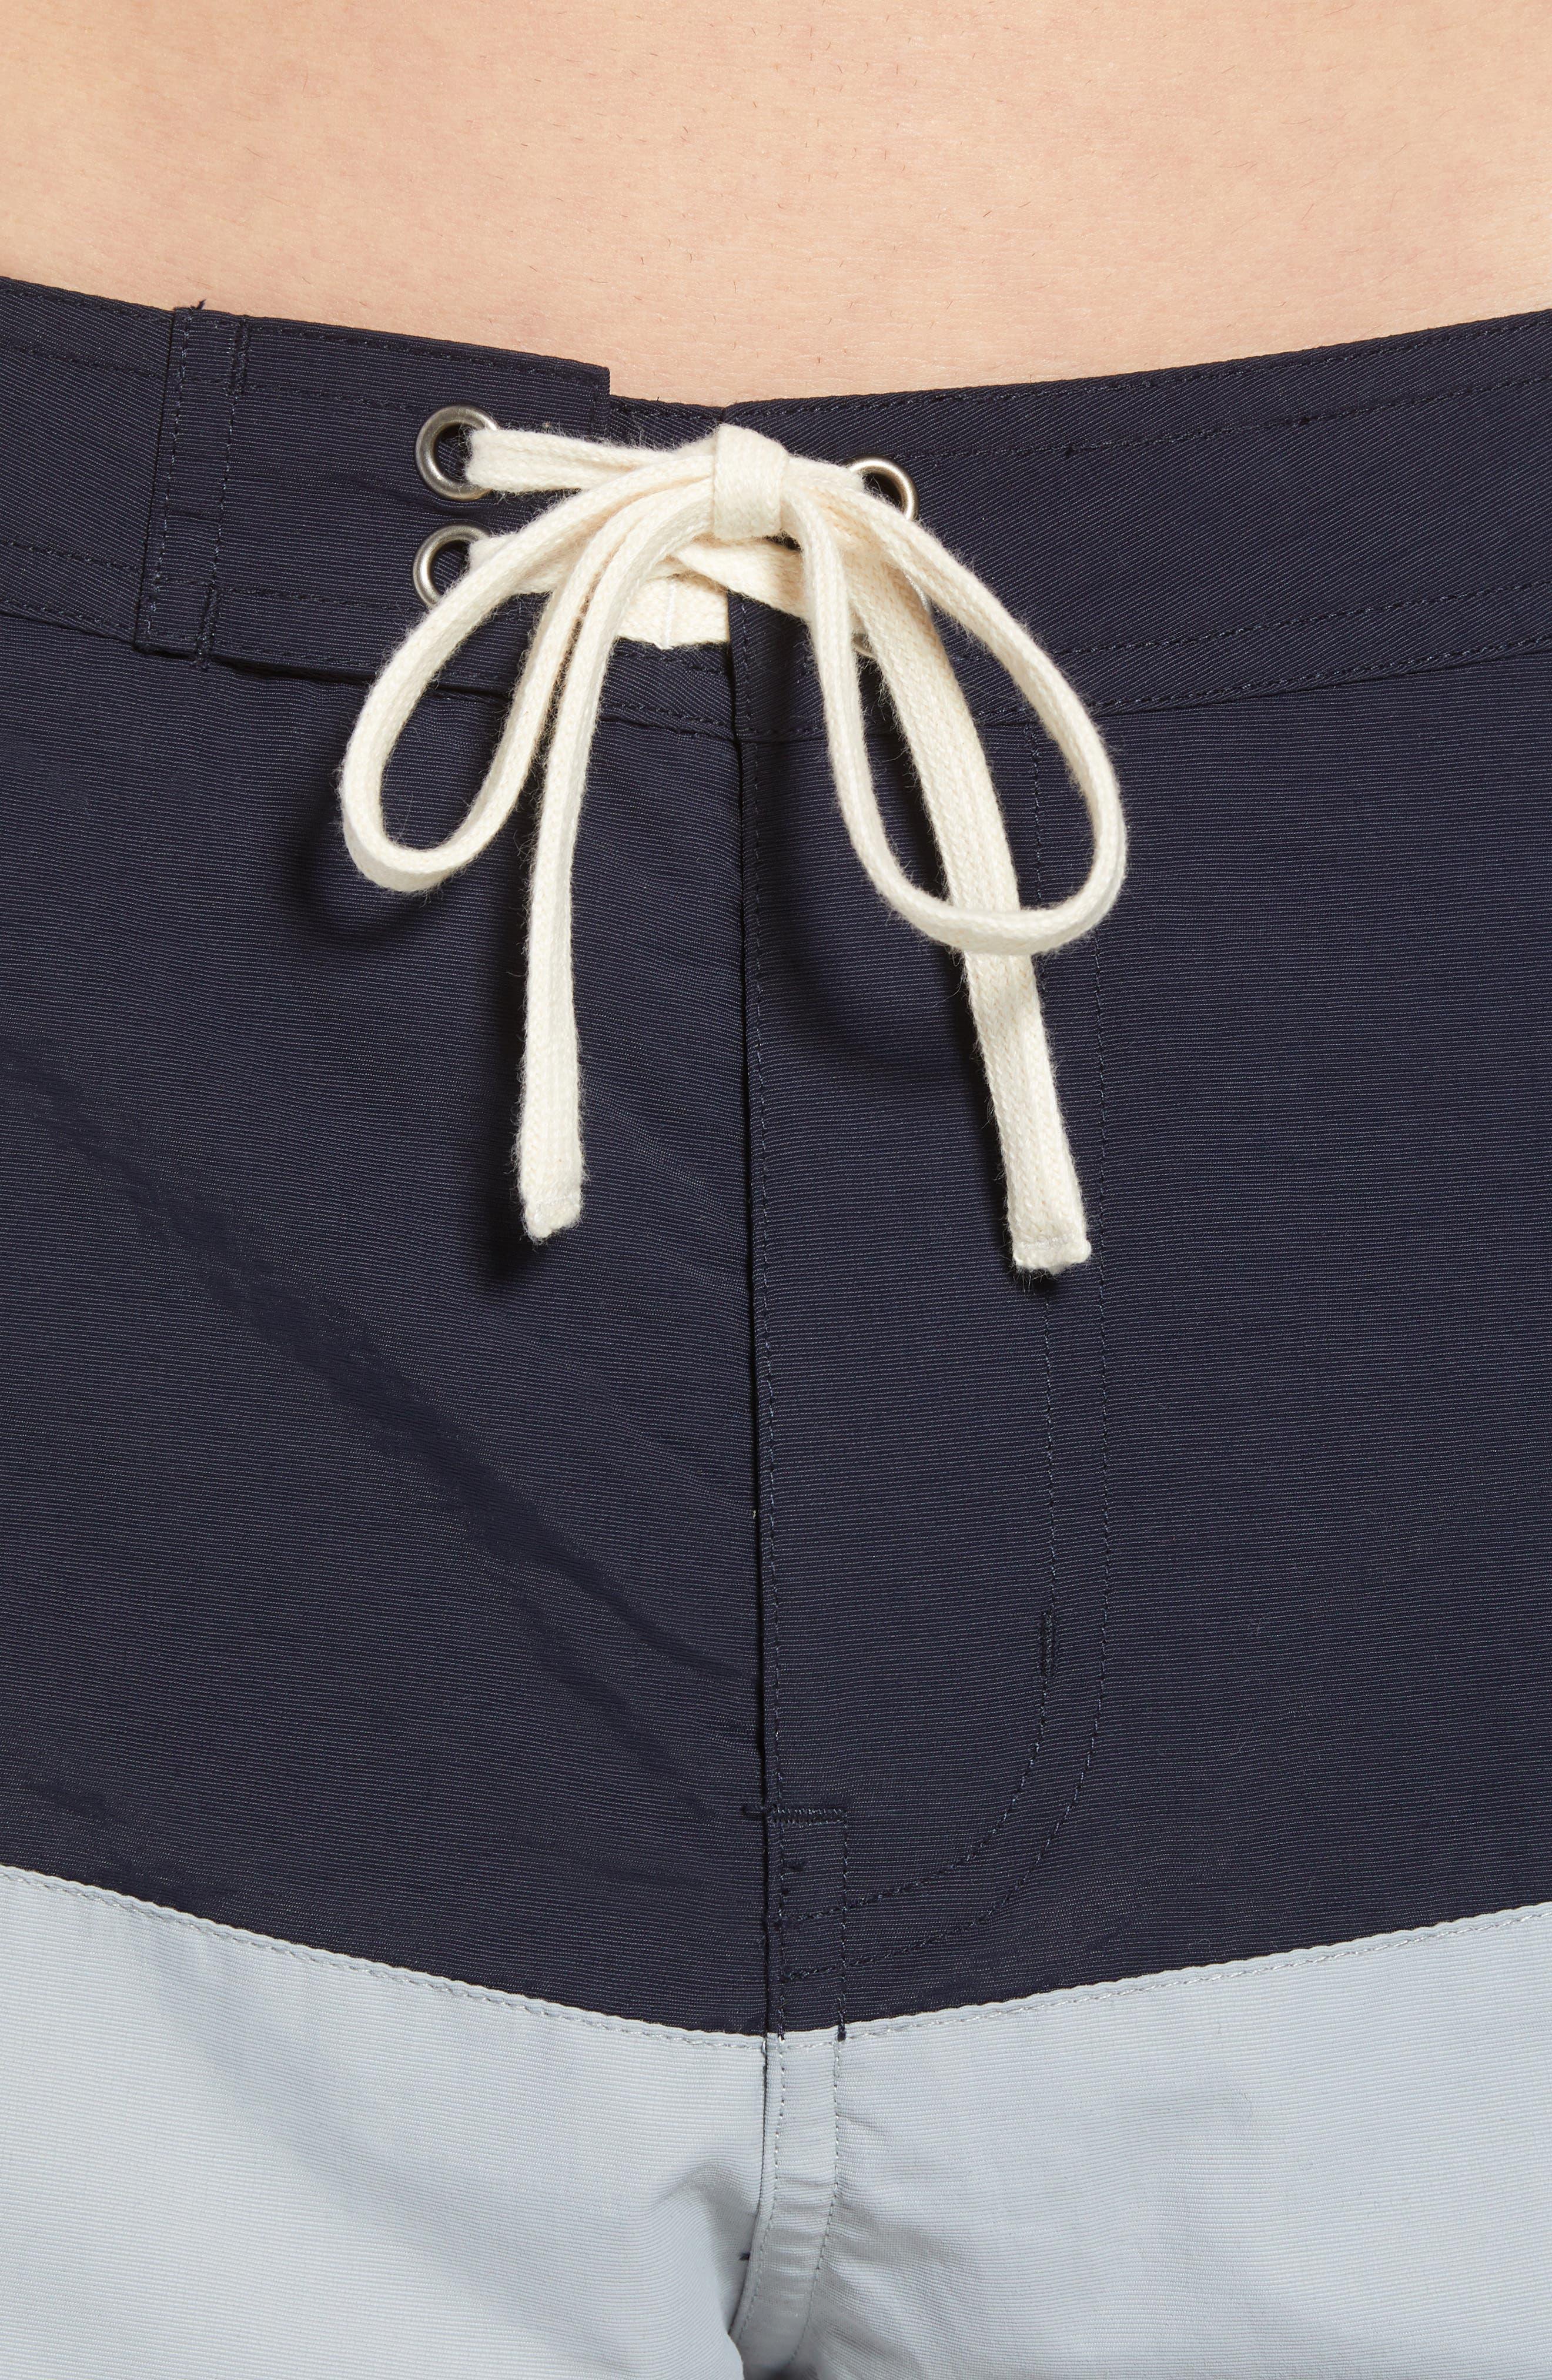 Ennis Board Shorts,                             Alternate thumbnail 4, color,                             MIDNIGHT/ STONE BLUE